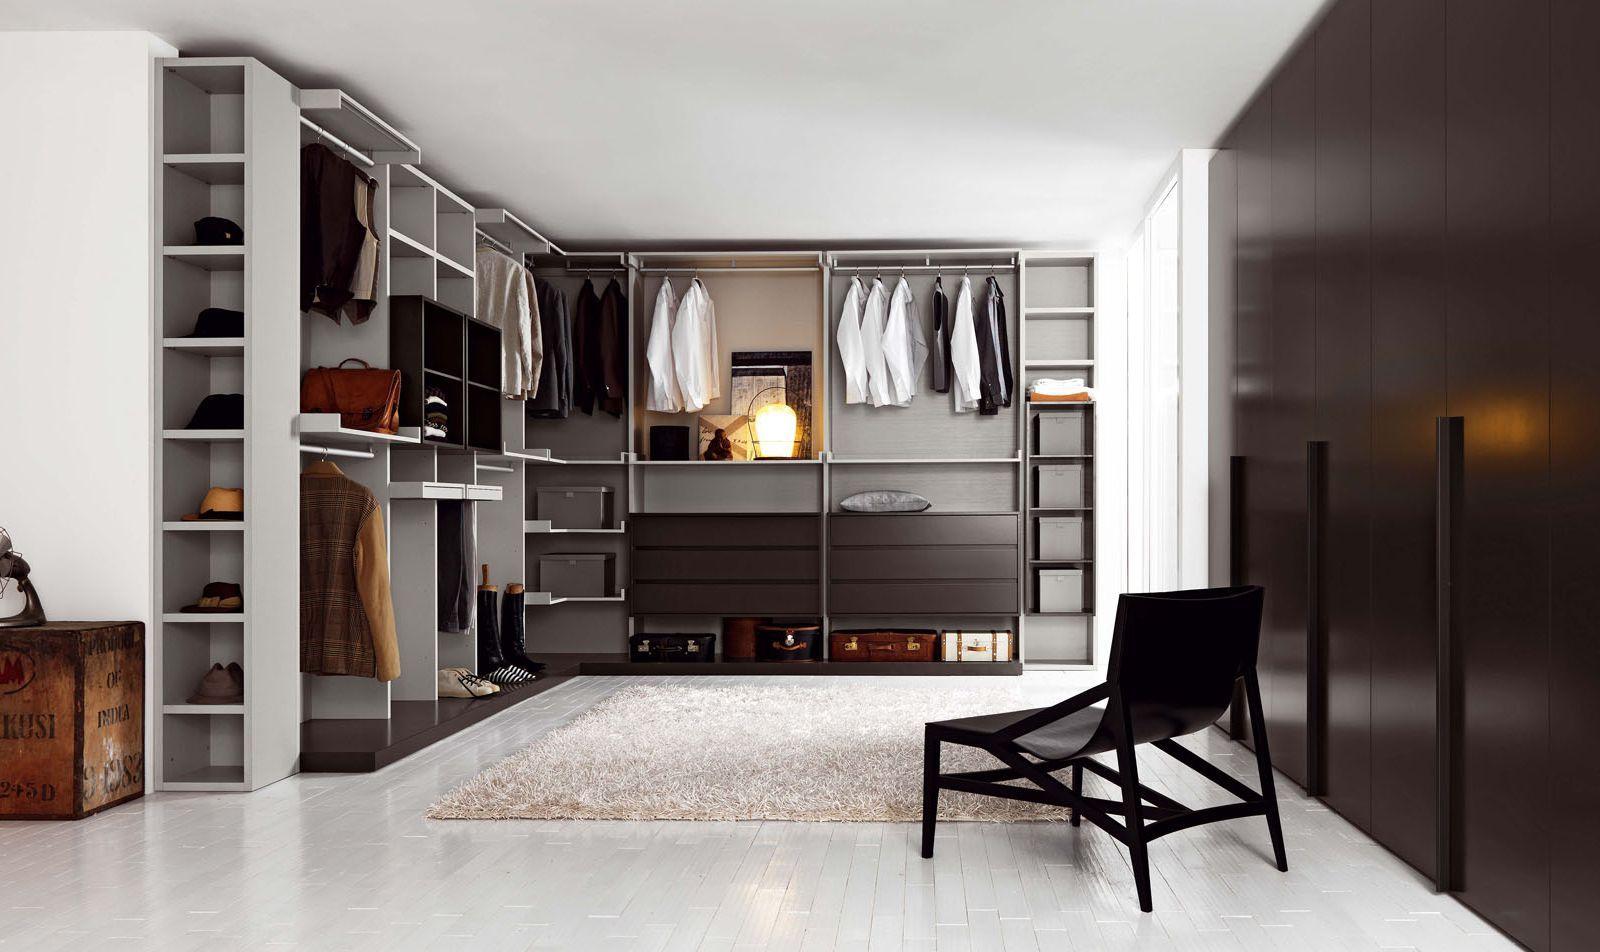 novamobili wing cabina armadio tempo cabine design. Black Bedroom Furniture Sets. Home Design Ideas